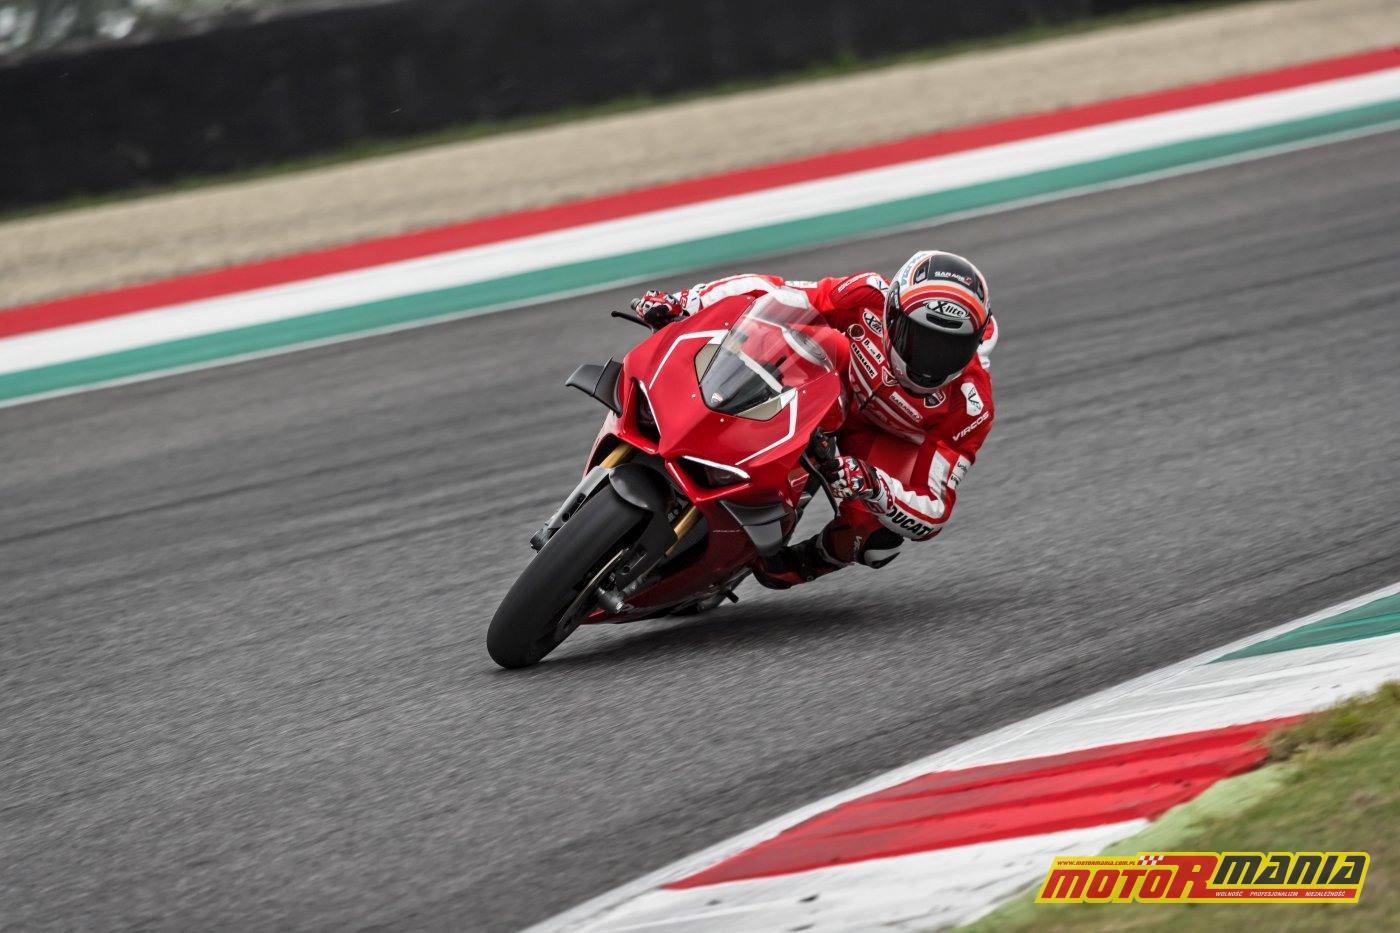 Ducati Panigale V4 R 2019 (52)